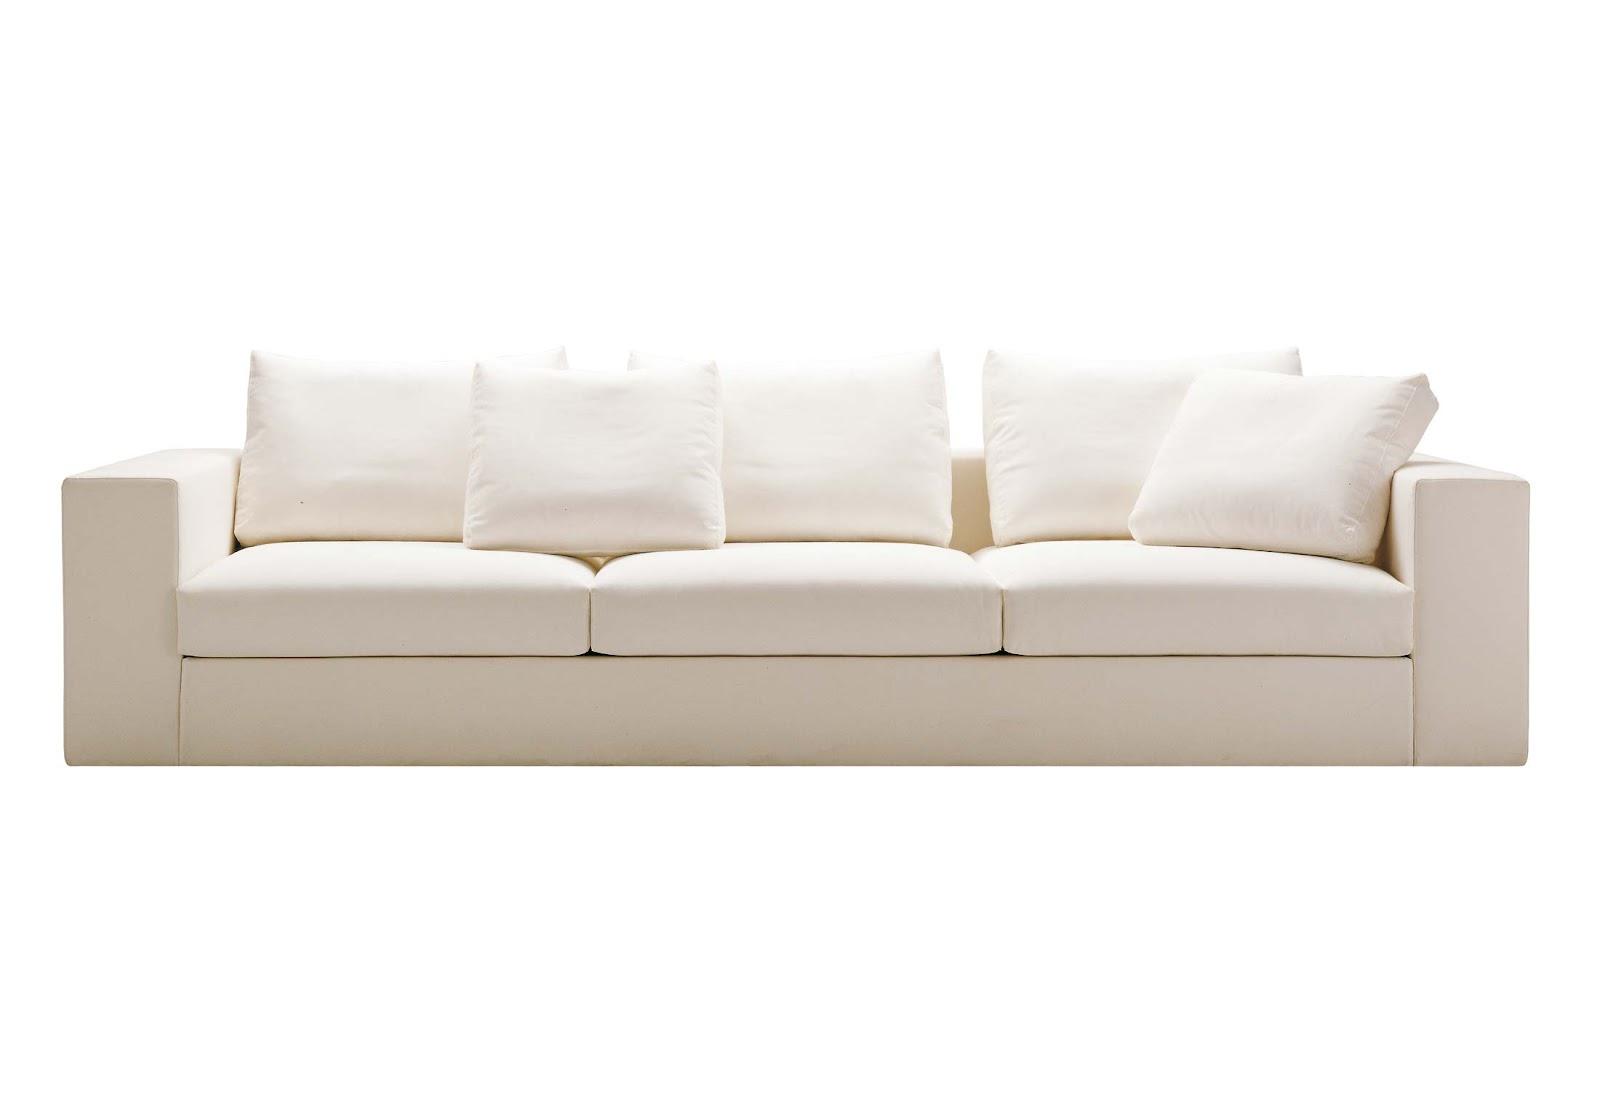 Zanotta Sofa Bed Stylus Sofas Beta By Designer Furniture Fitted